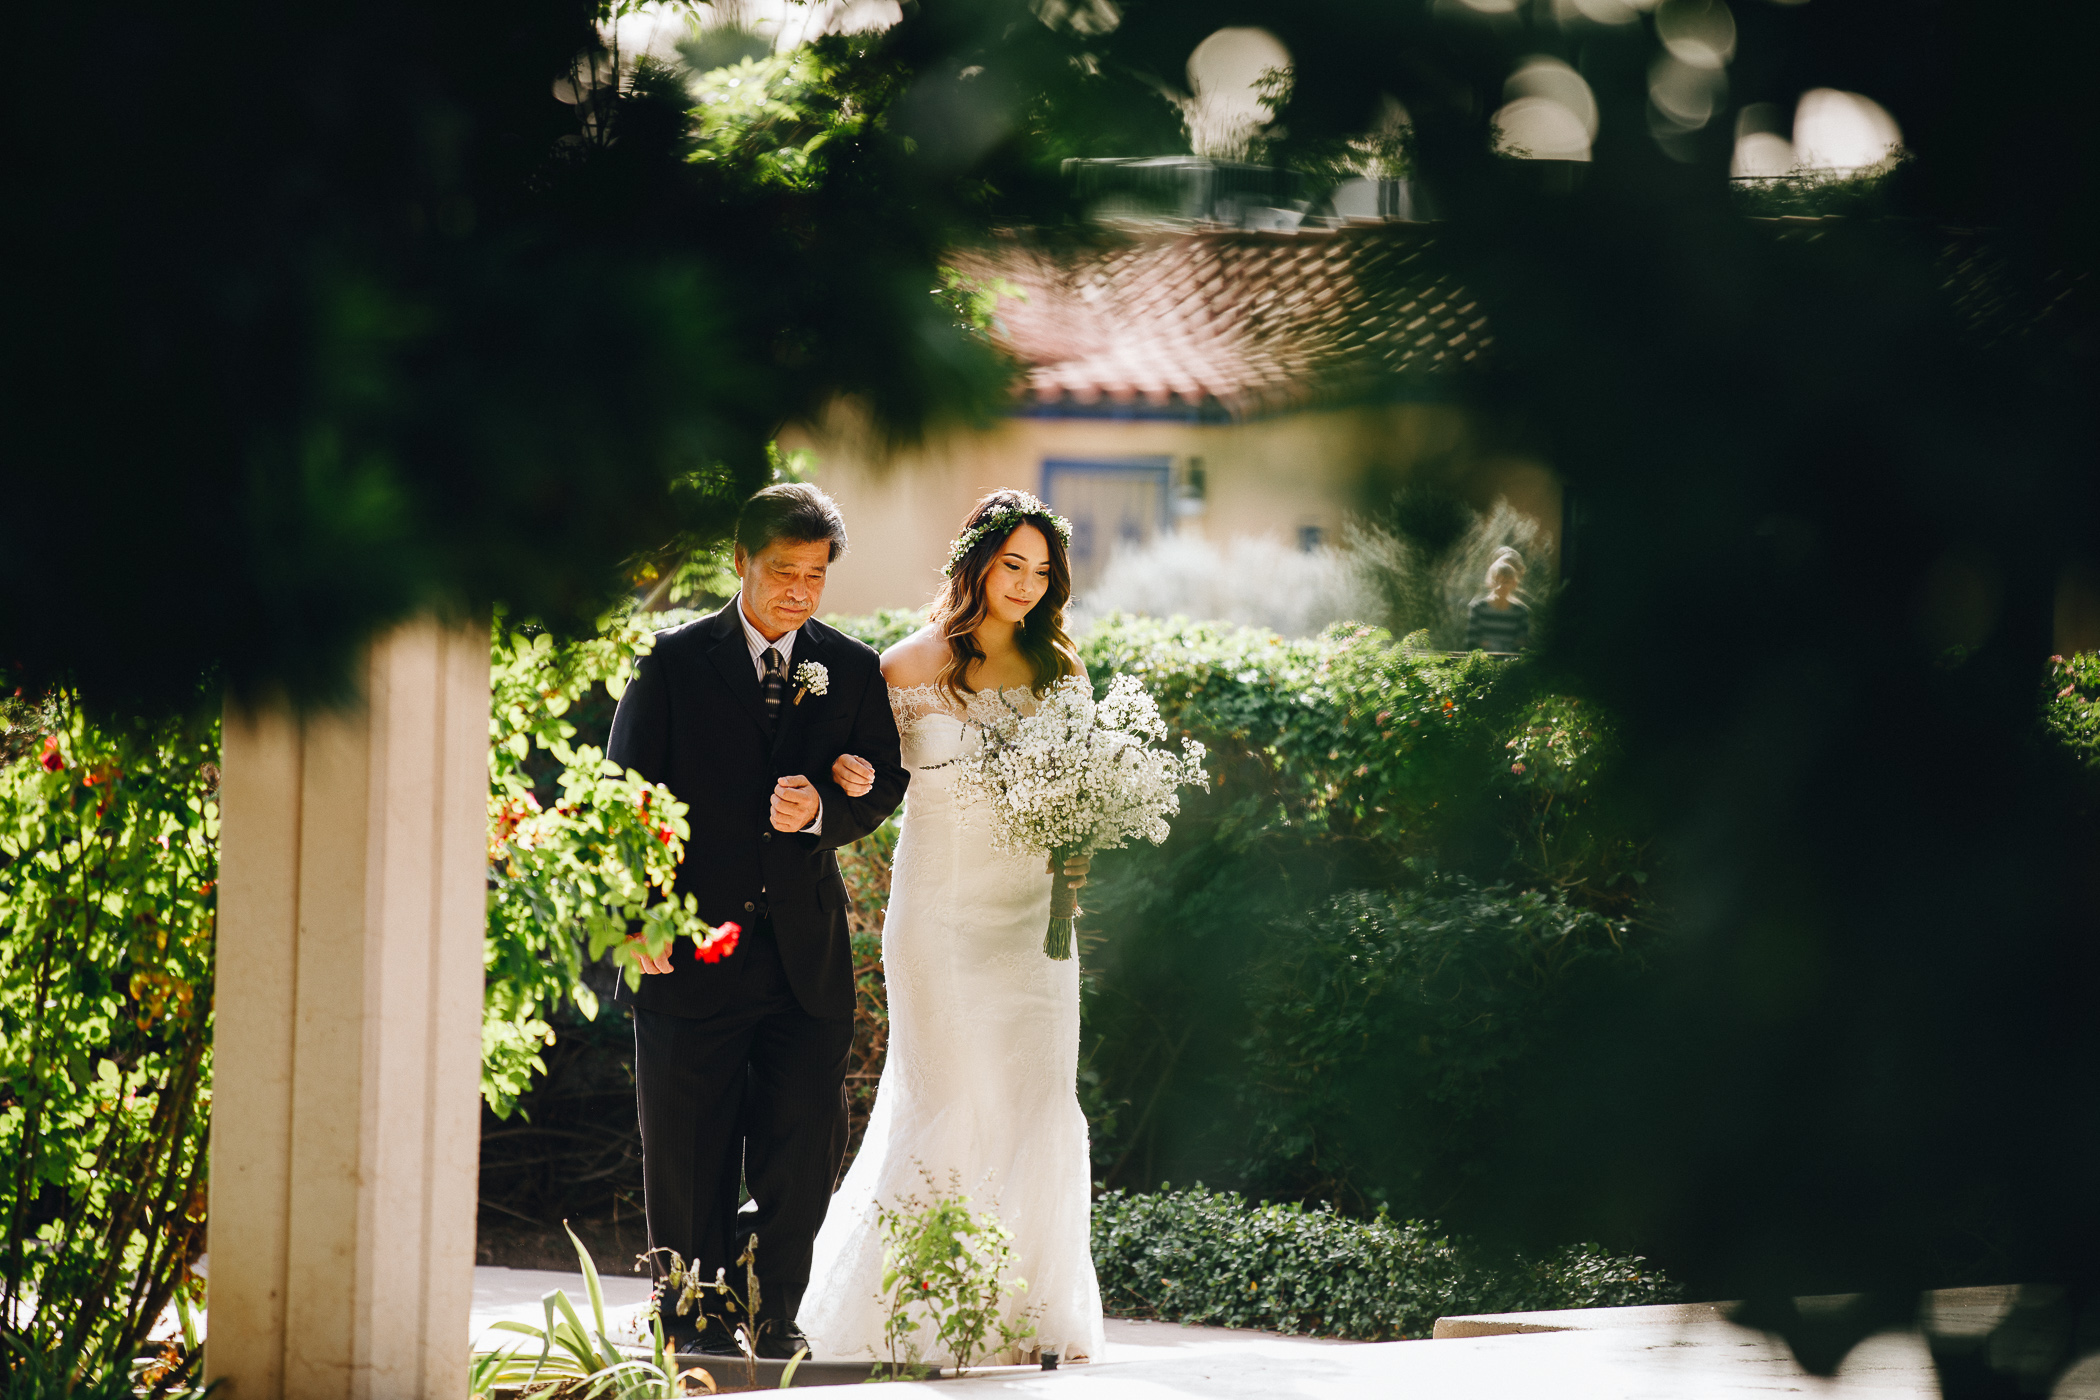 181104-Luxium-Weddings-Arizona-@matt__Le-Brandon-Kariana-Phoenix-Valley-Garden-Center-1058.jpg